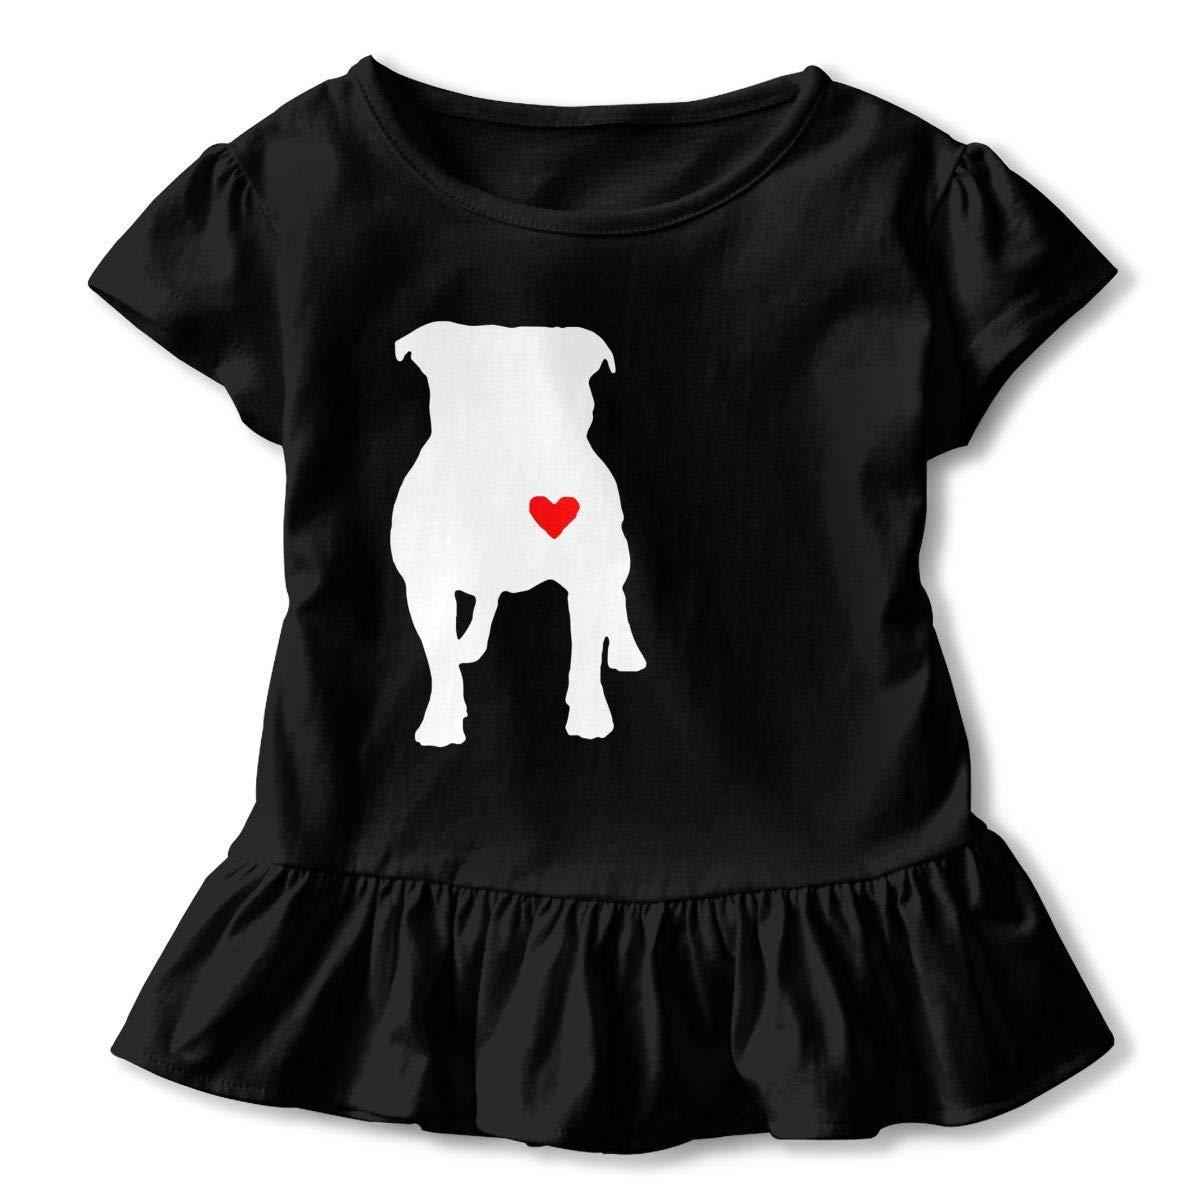 PMsunglasses Short-Sleeve Pitbull Heart T-Shirts for Kids 2-6T Ruffled Tunic Tops with Falbala